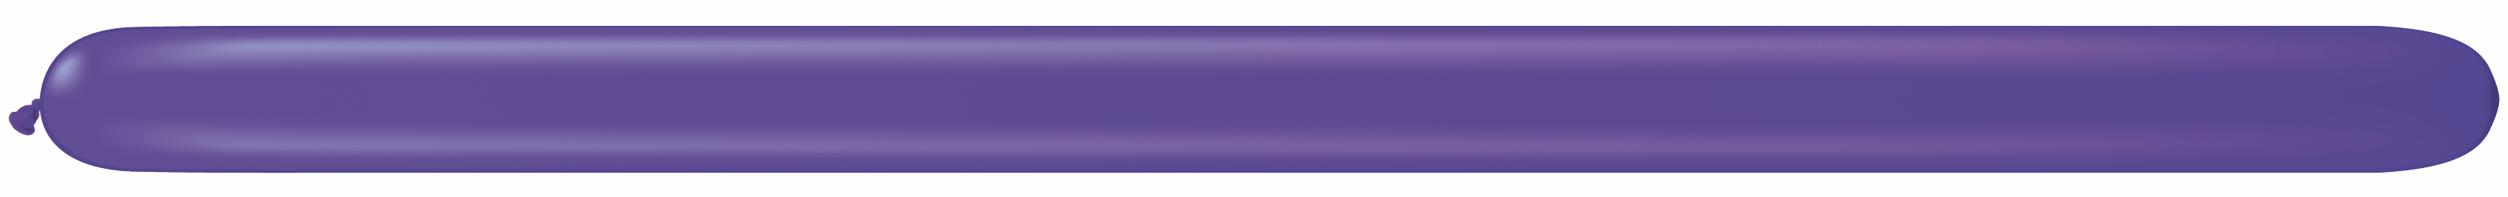 350Q Latex Balloons (100 Count) Purple Violet